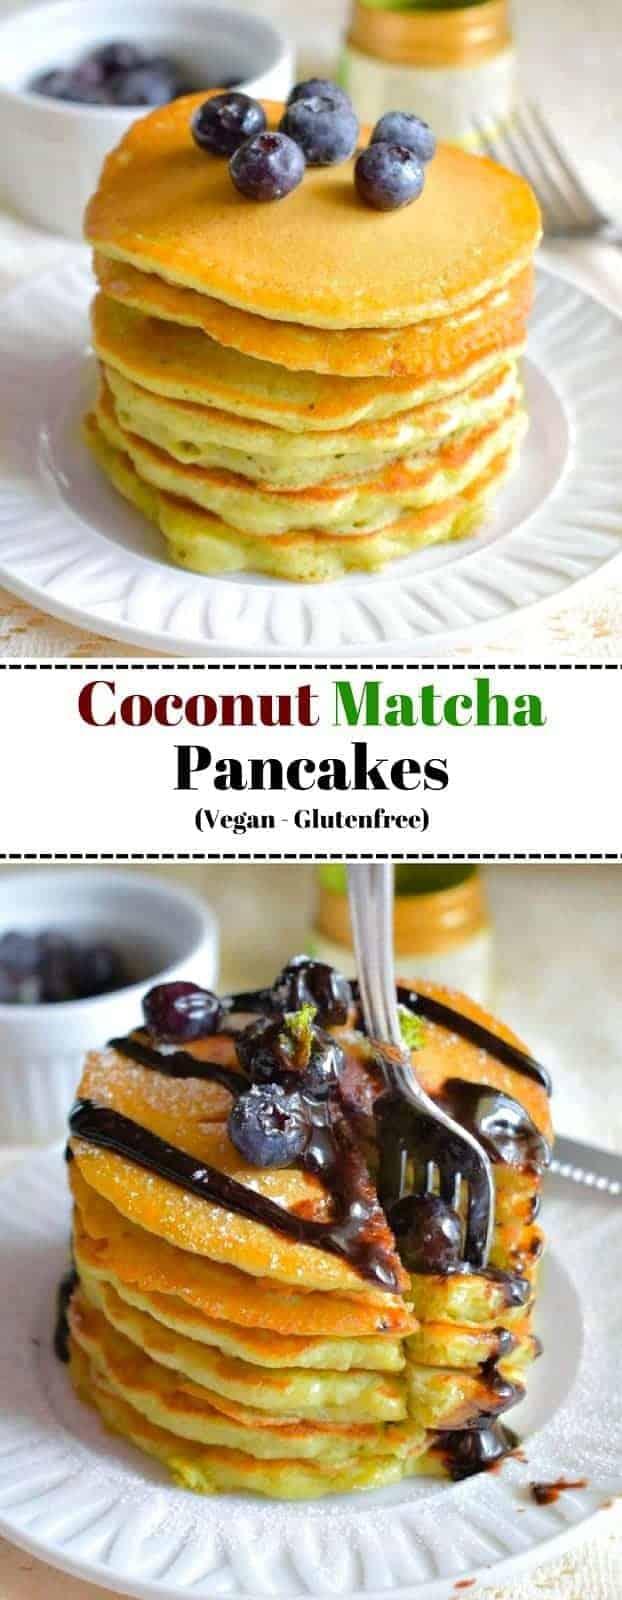 Coconut Matcha Pancakes(Vegan-Glutenfree): #matcha #pancakes #almondflour #vegan